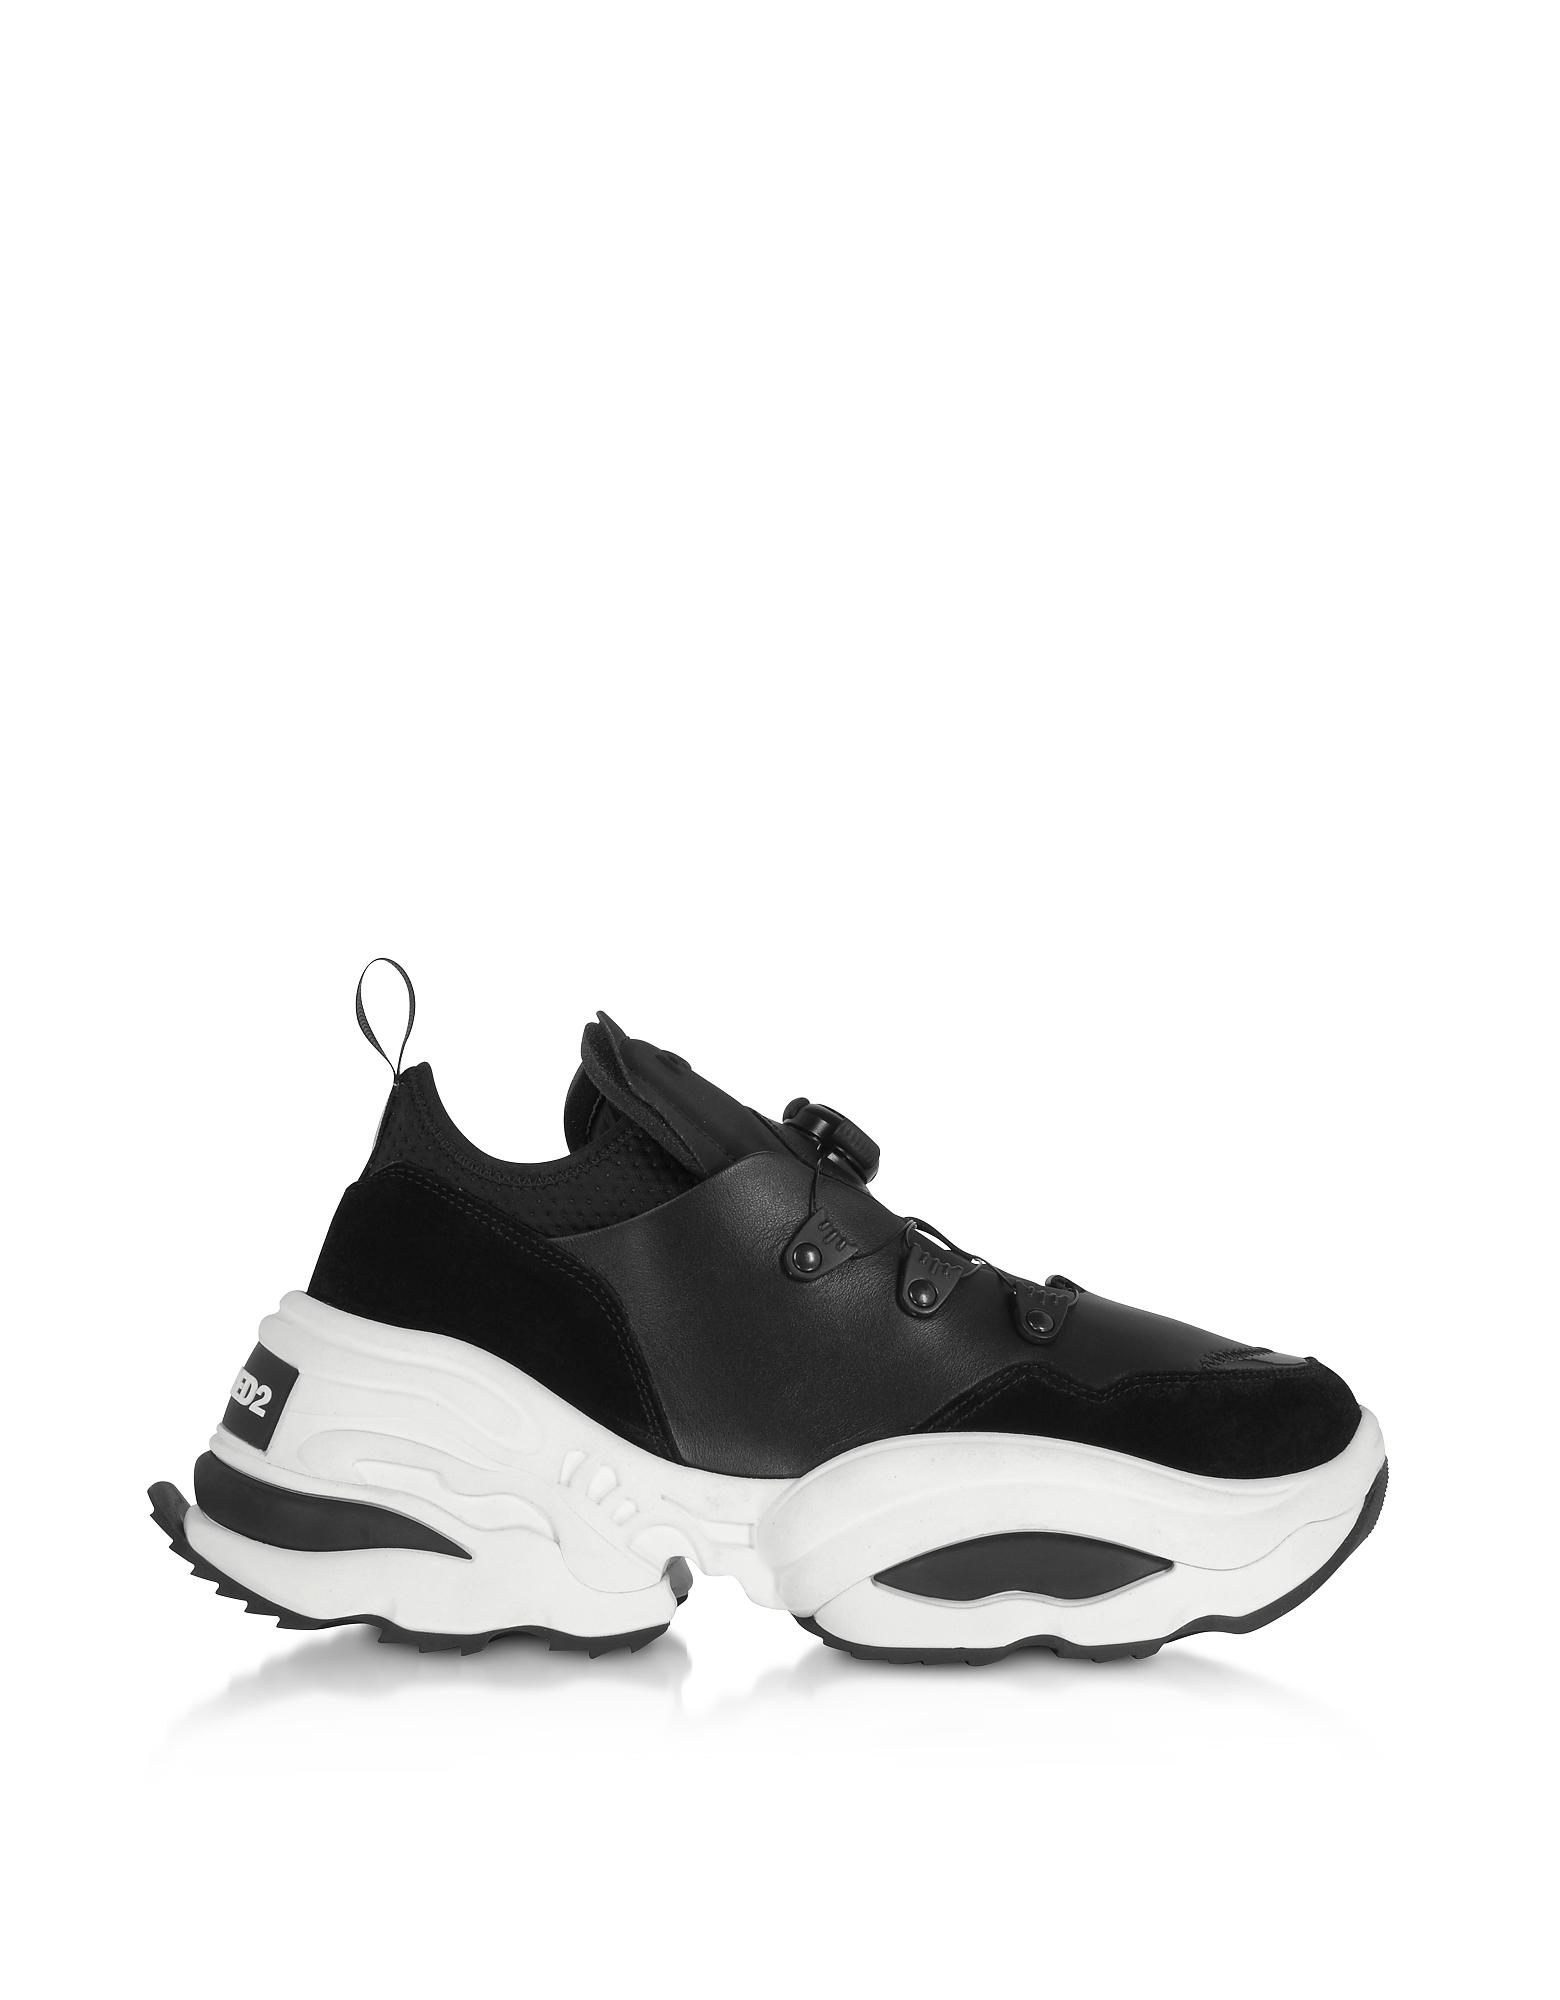 Black Backyard Punk Leather Sneakers